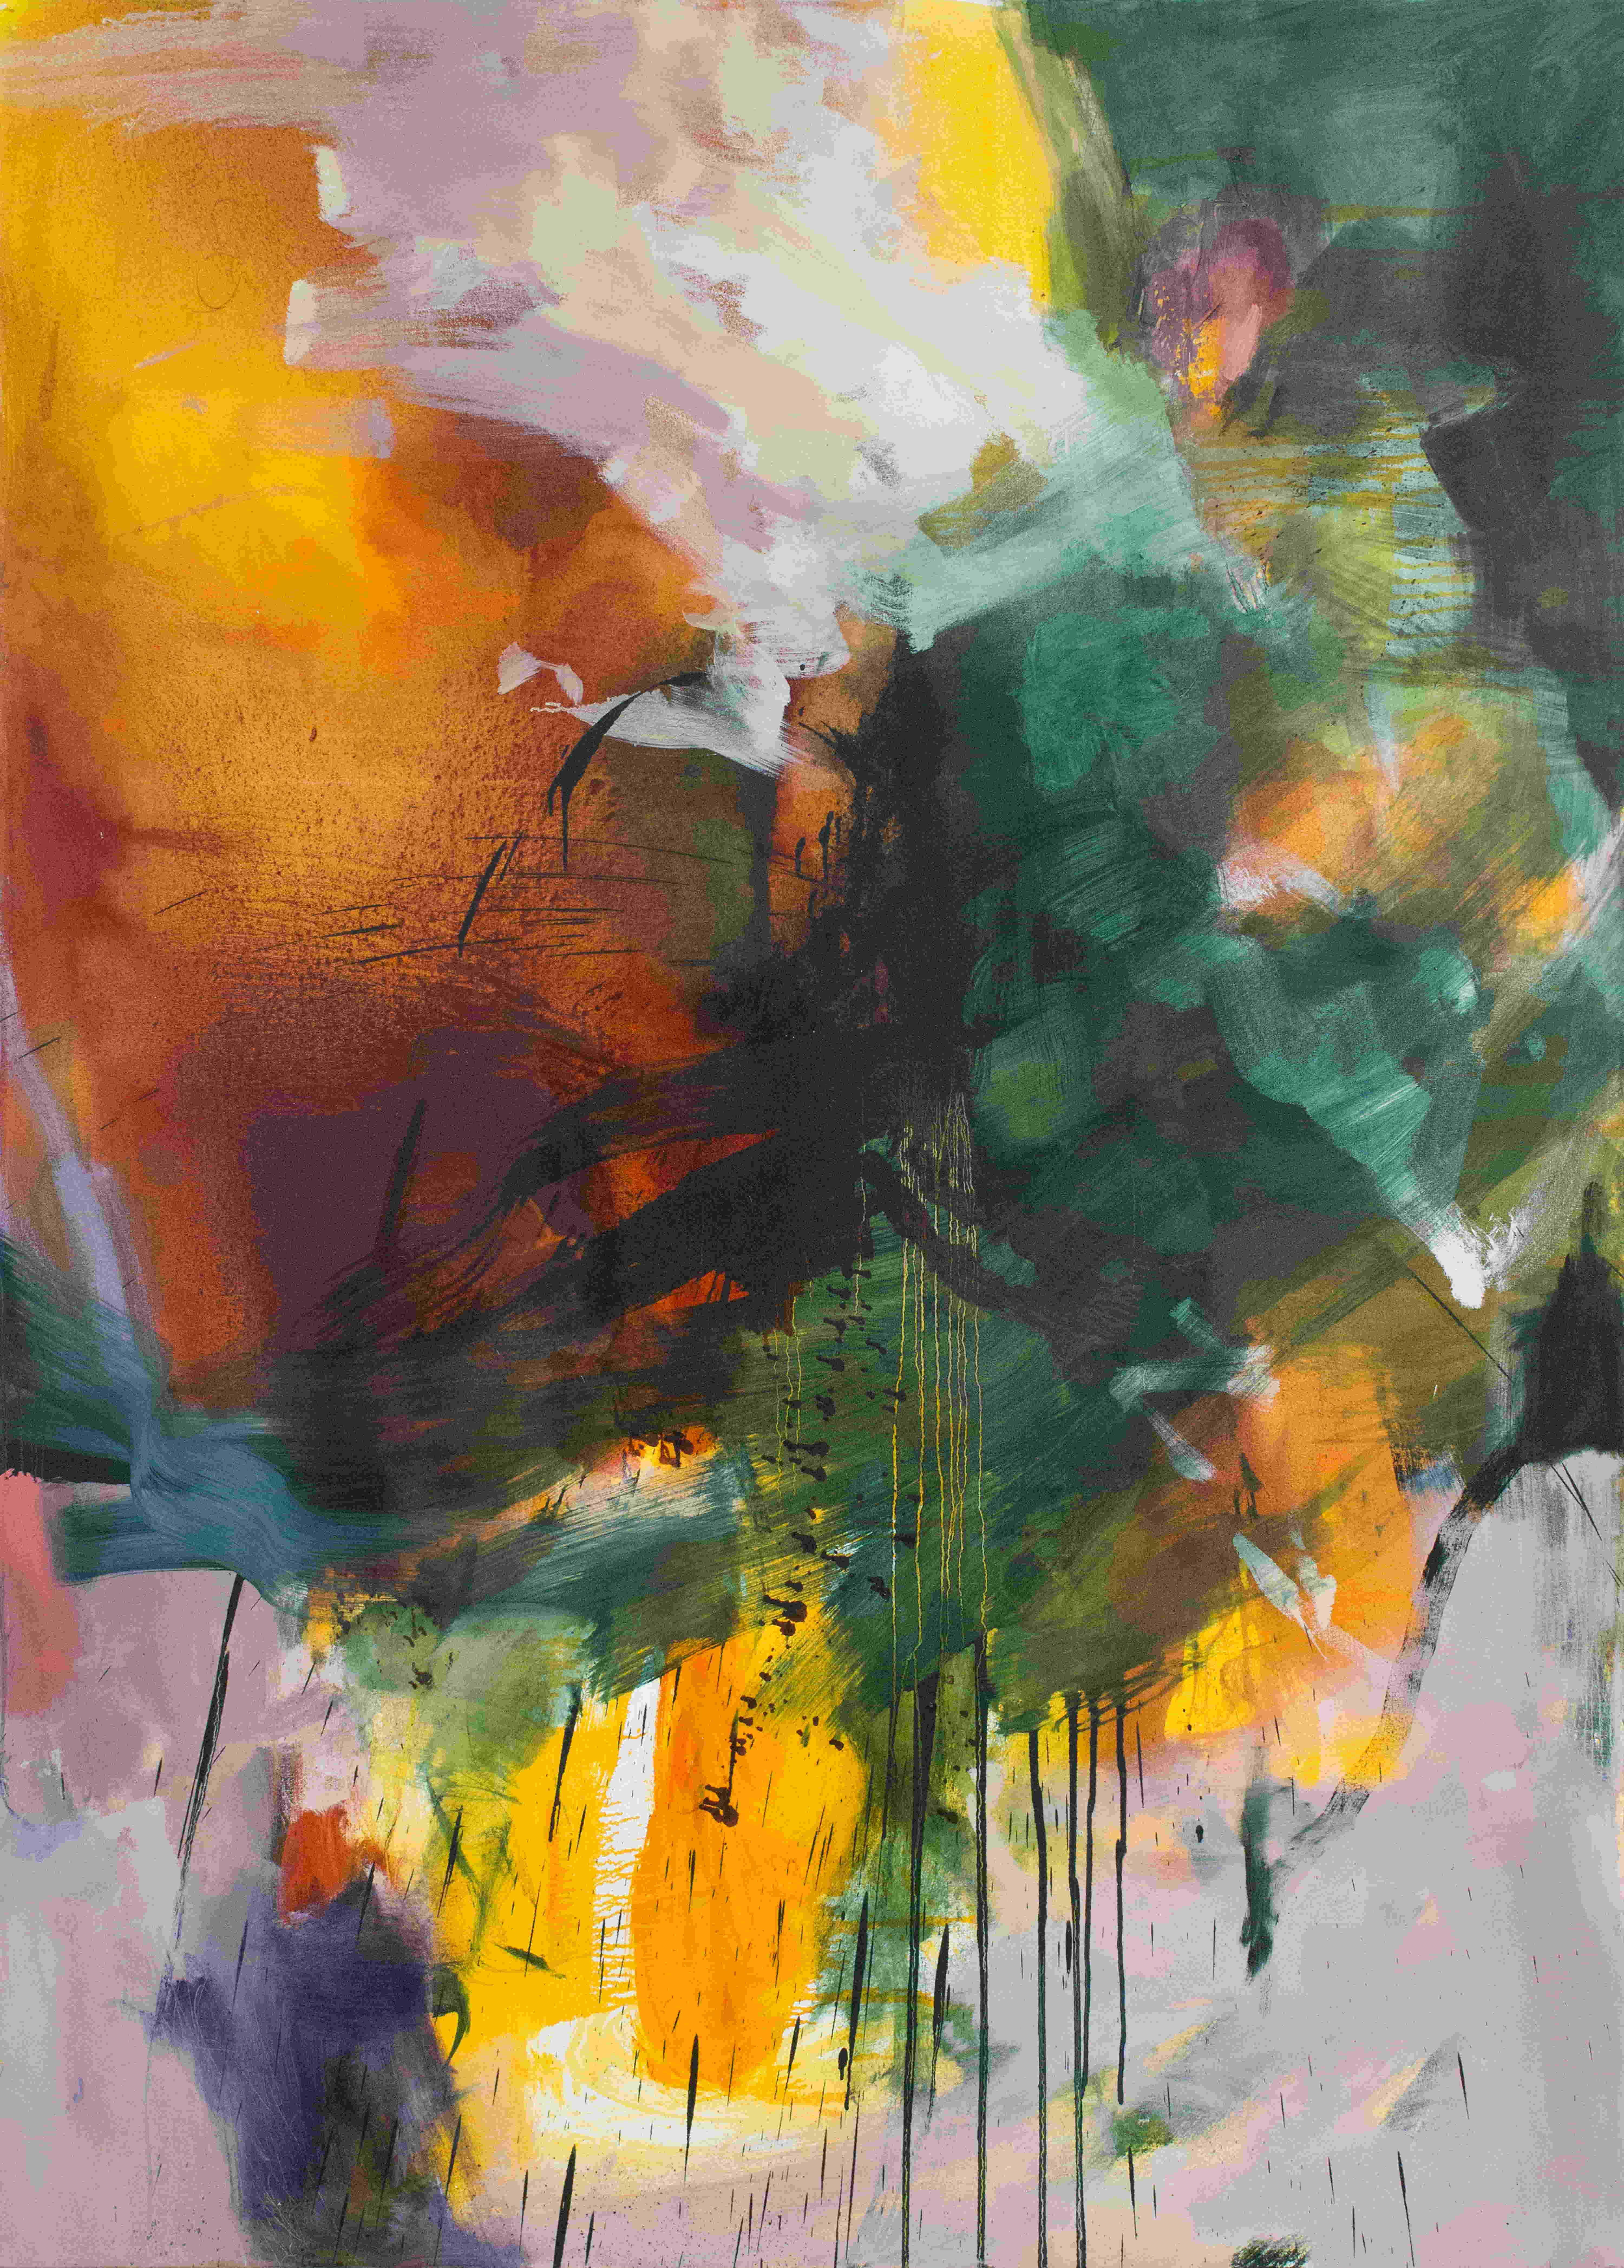 Pin by ARTIQ on The Graduate Art Prize 2017 Shortlist